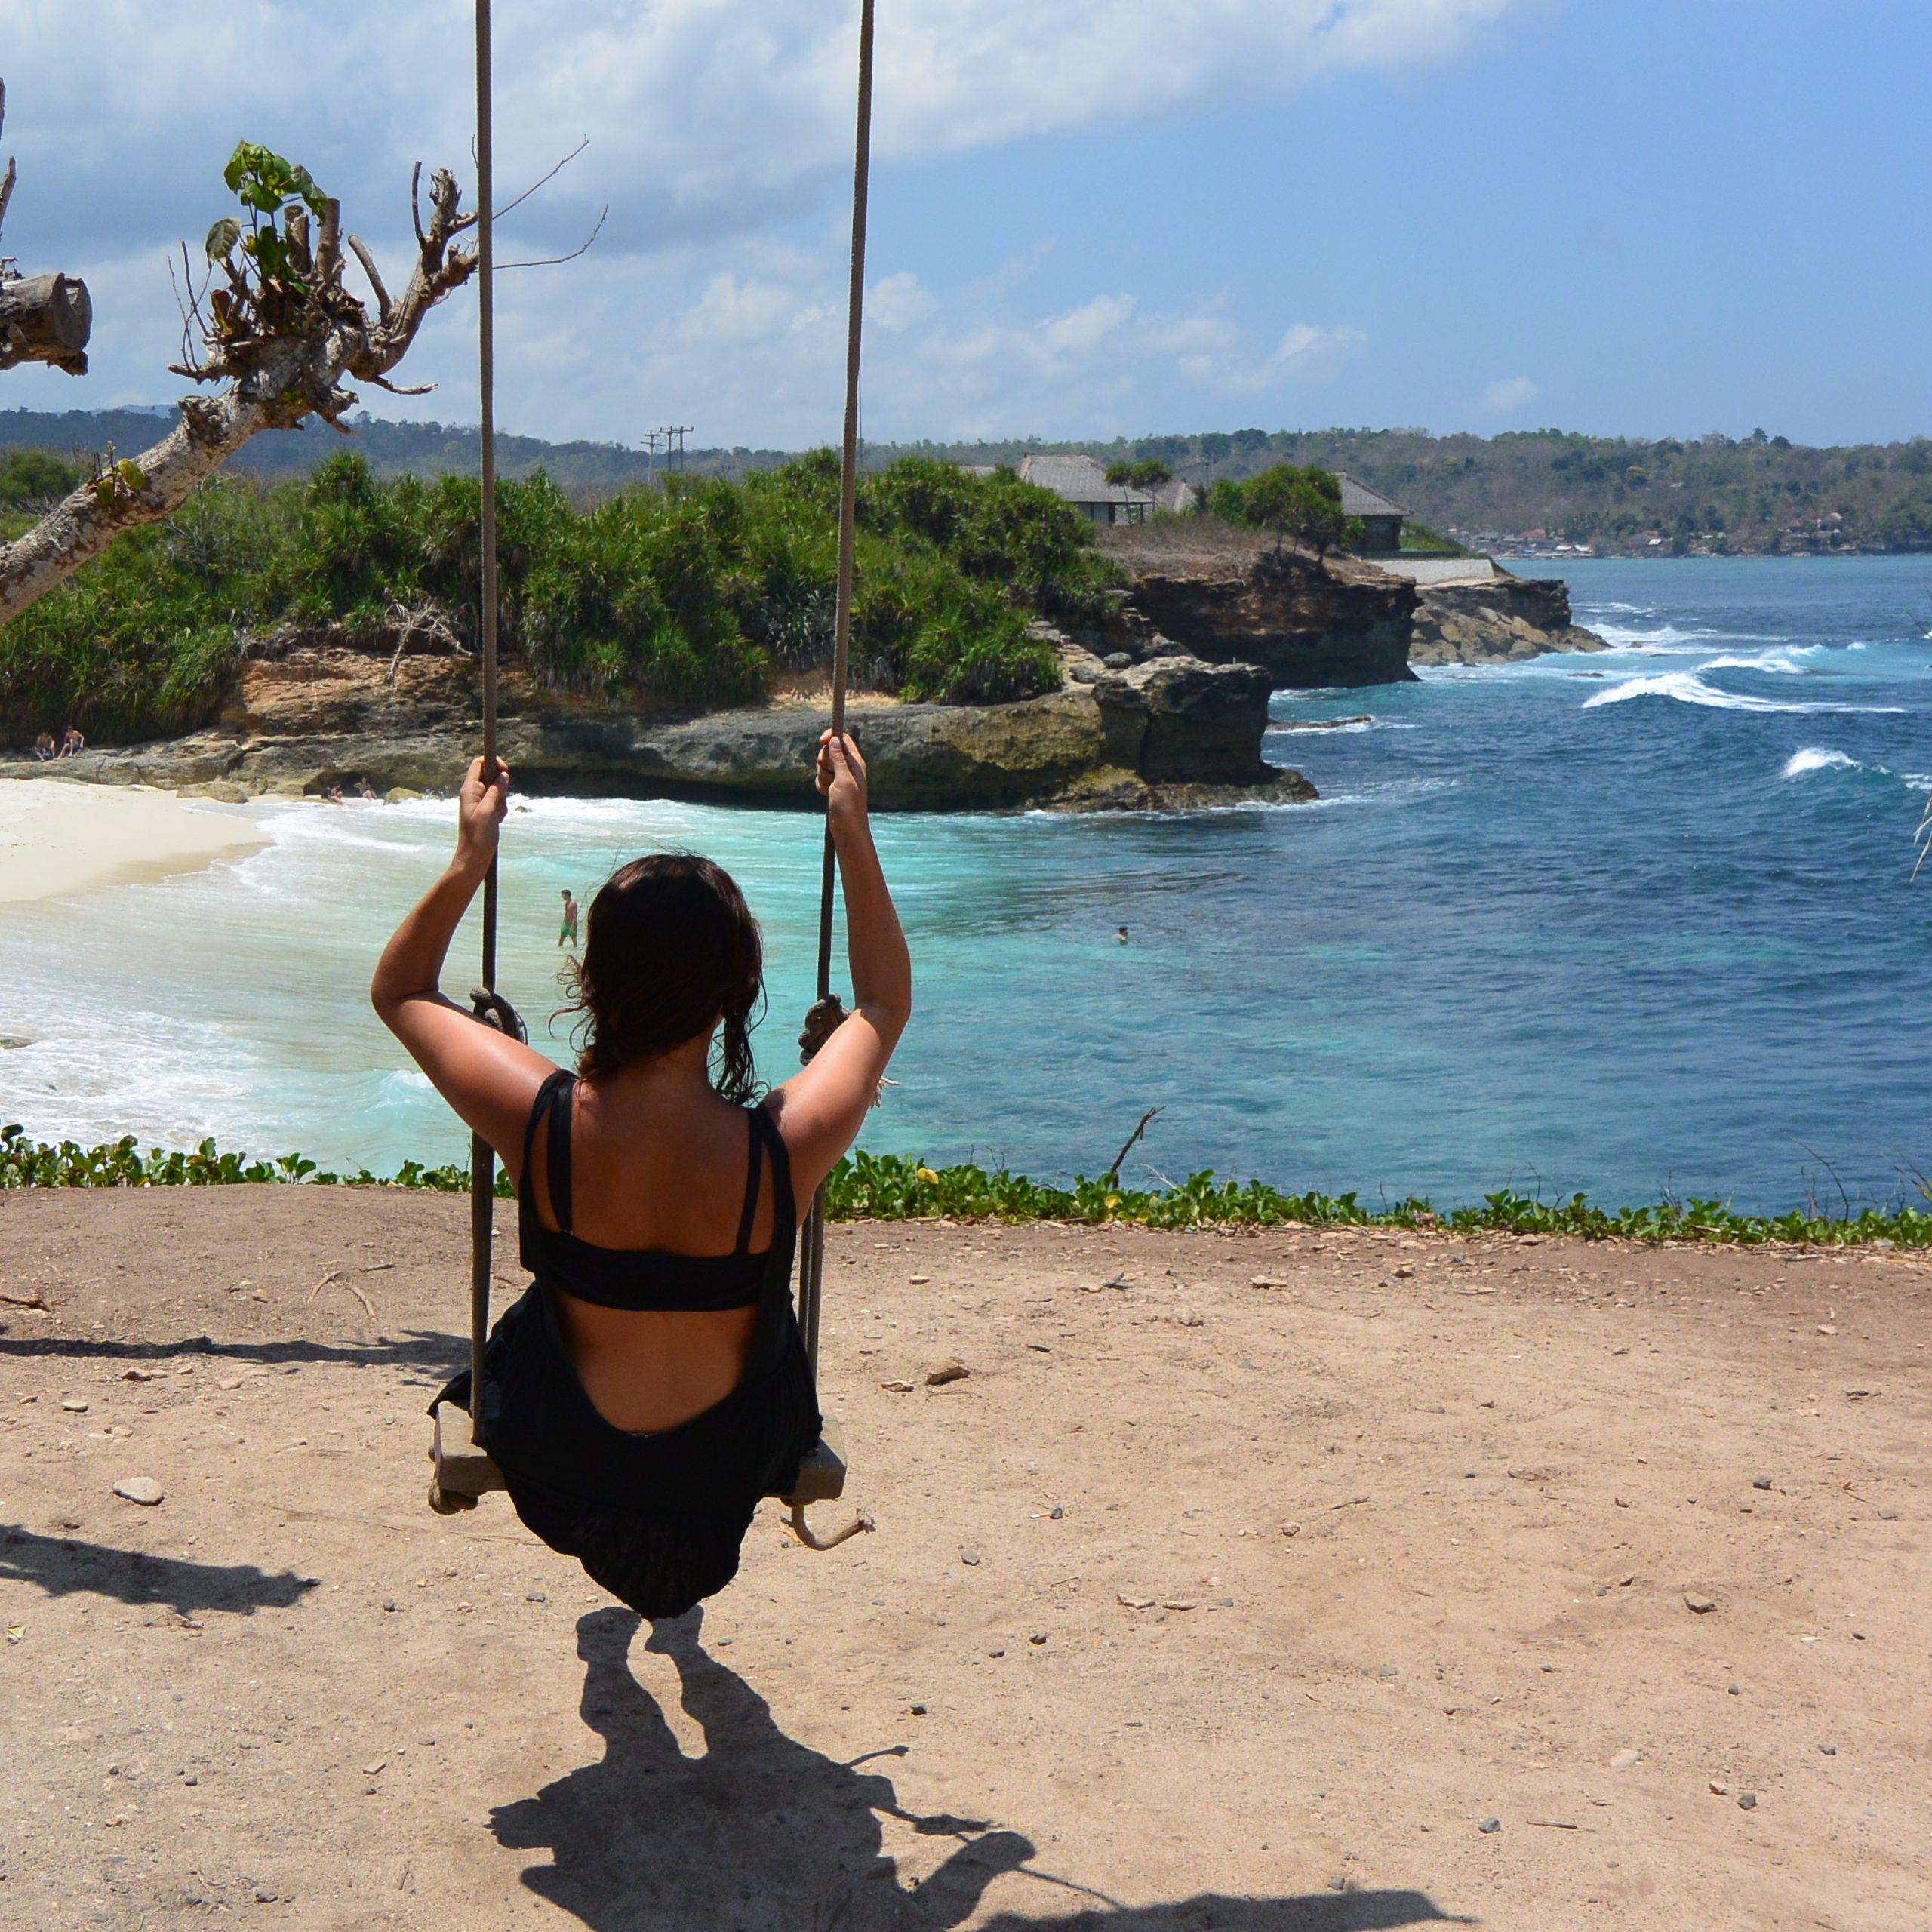 Mengunjungi Pantai Impian di Nusa Lembongan, Dream Beach